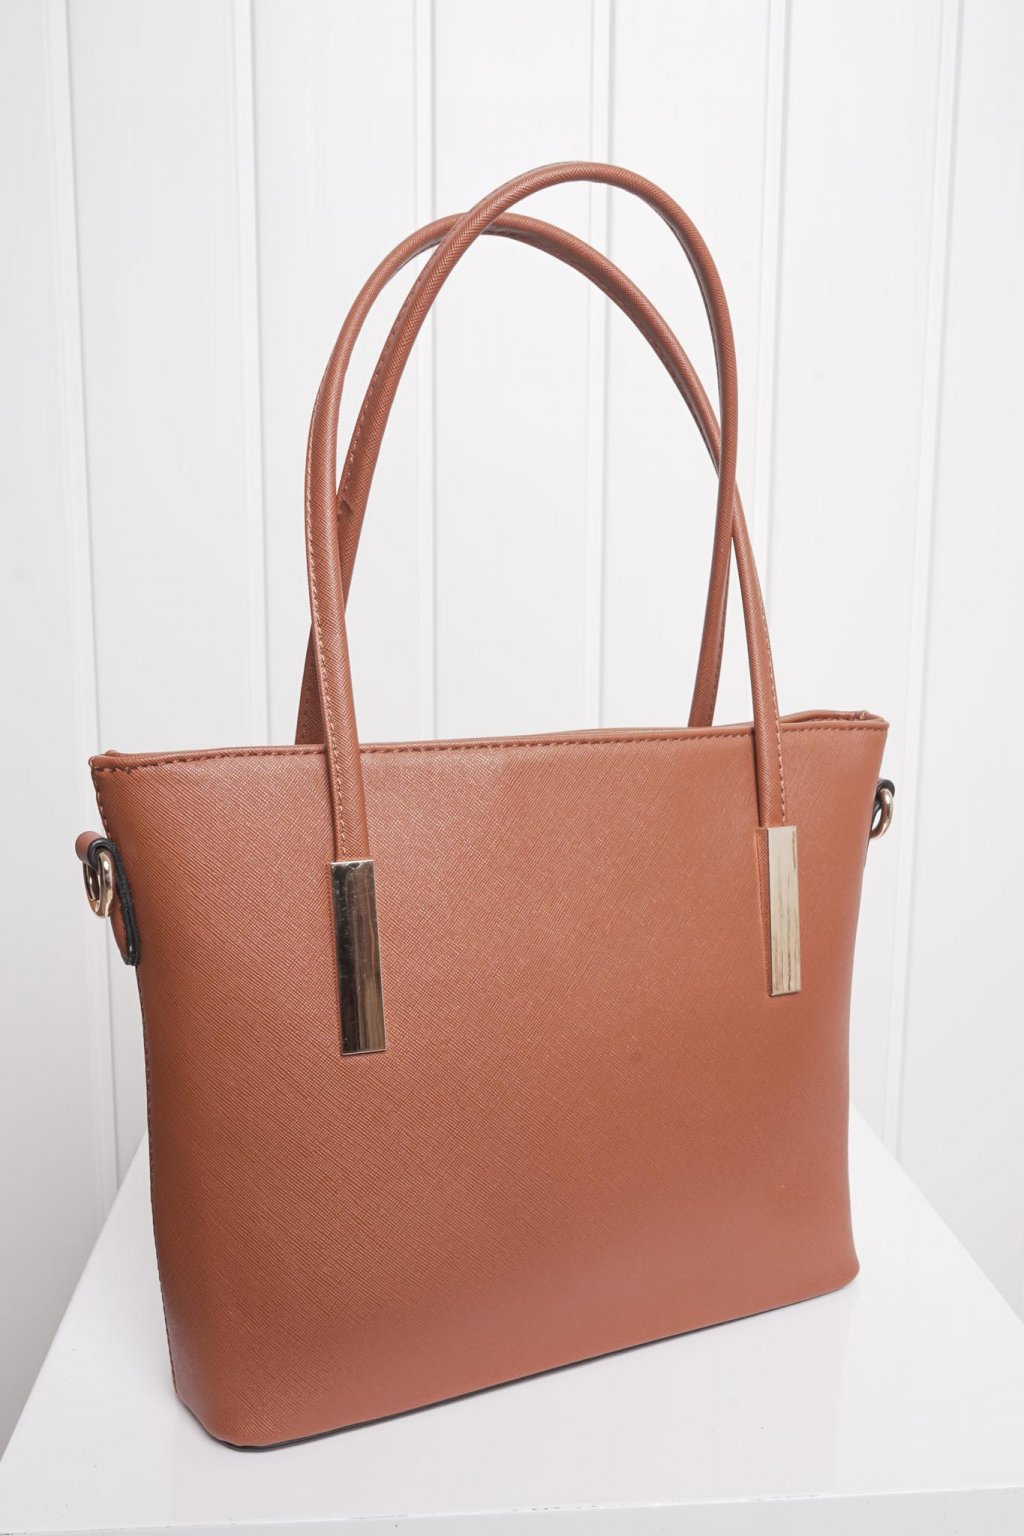 Kabelka, ruksak, dobrá cena, čierna kabelka, čierny ruksak, basic, kabelky, ruksaky 109